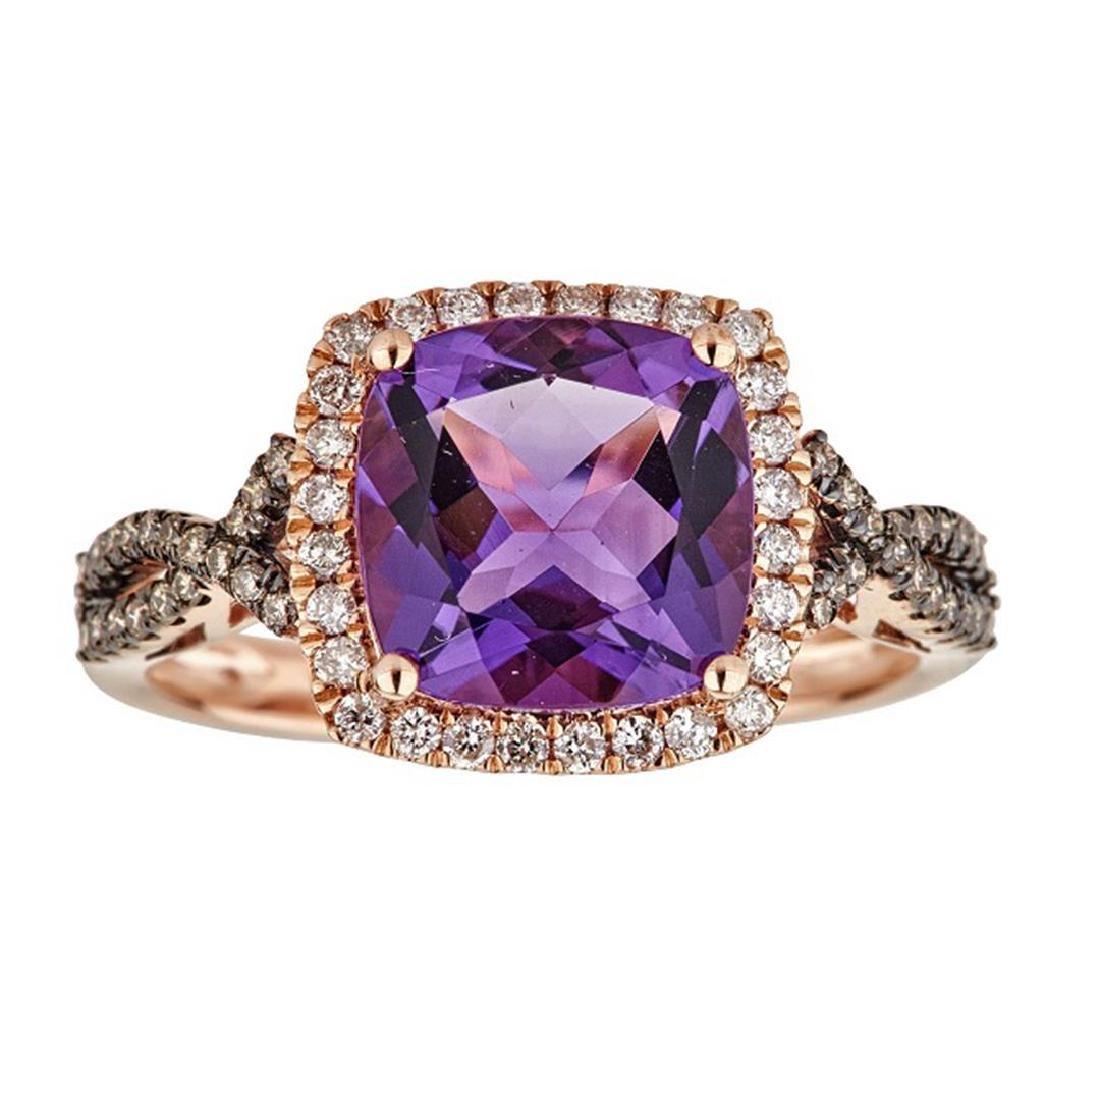 2.82 ctw Amethyst, Brown Diamond and Diamond Ring -